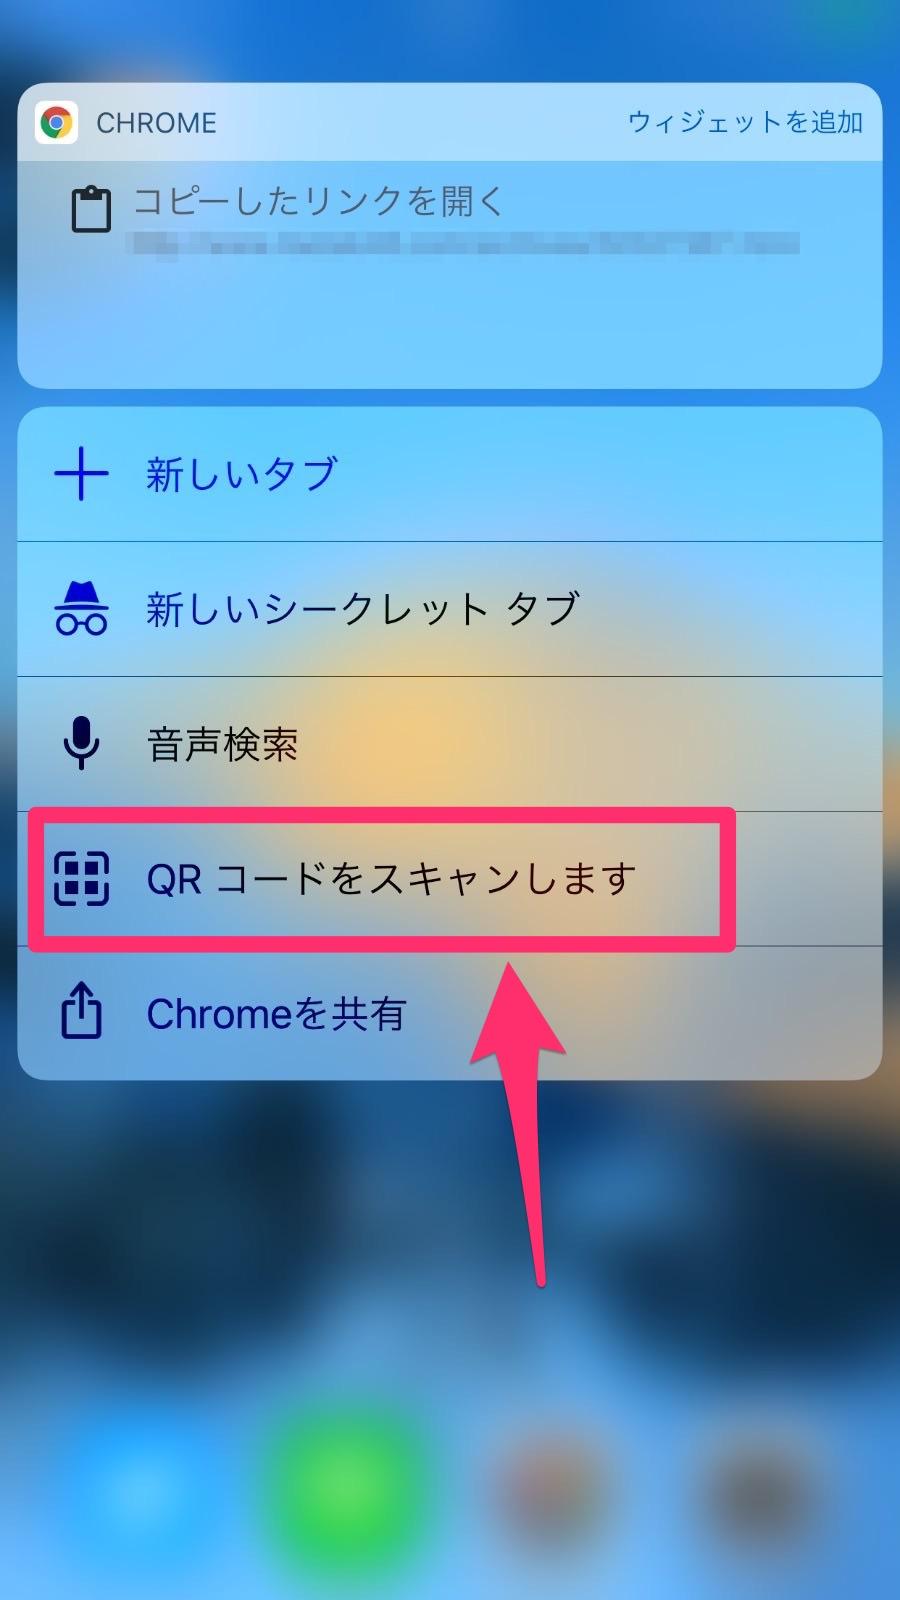 【Google Chrome】iOSアプリでQRコードの読み取り(スキャン)が可能に